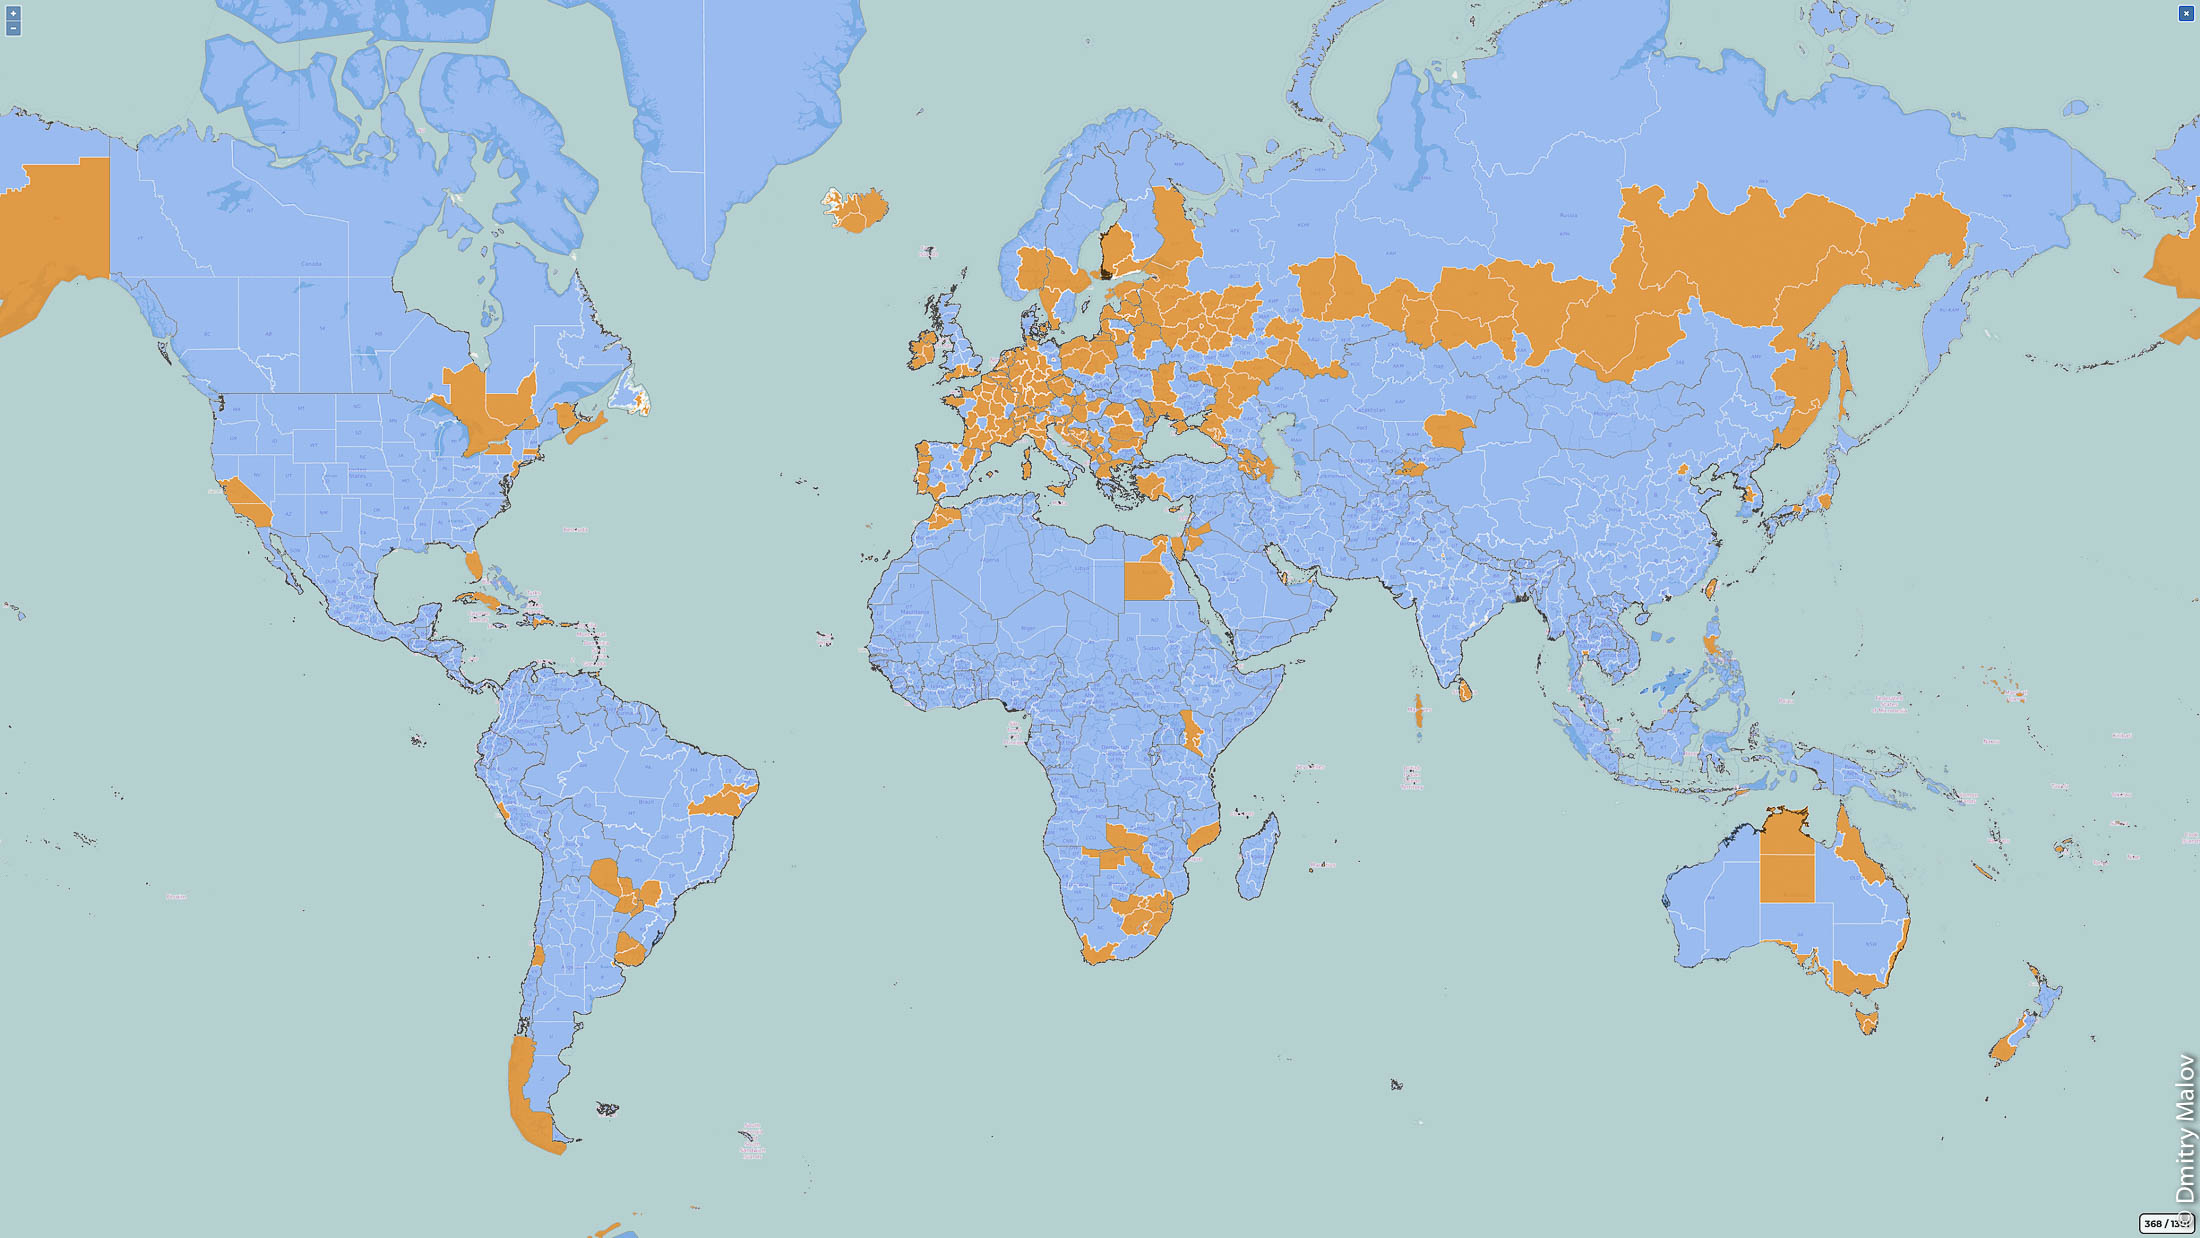 Dmitry Malov — visited countries and territories map. Карта стран и регионов мира, где был Дмитрий Малов.